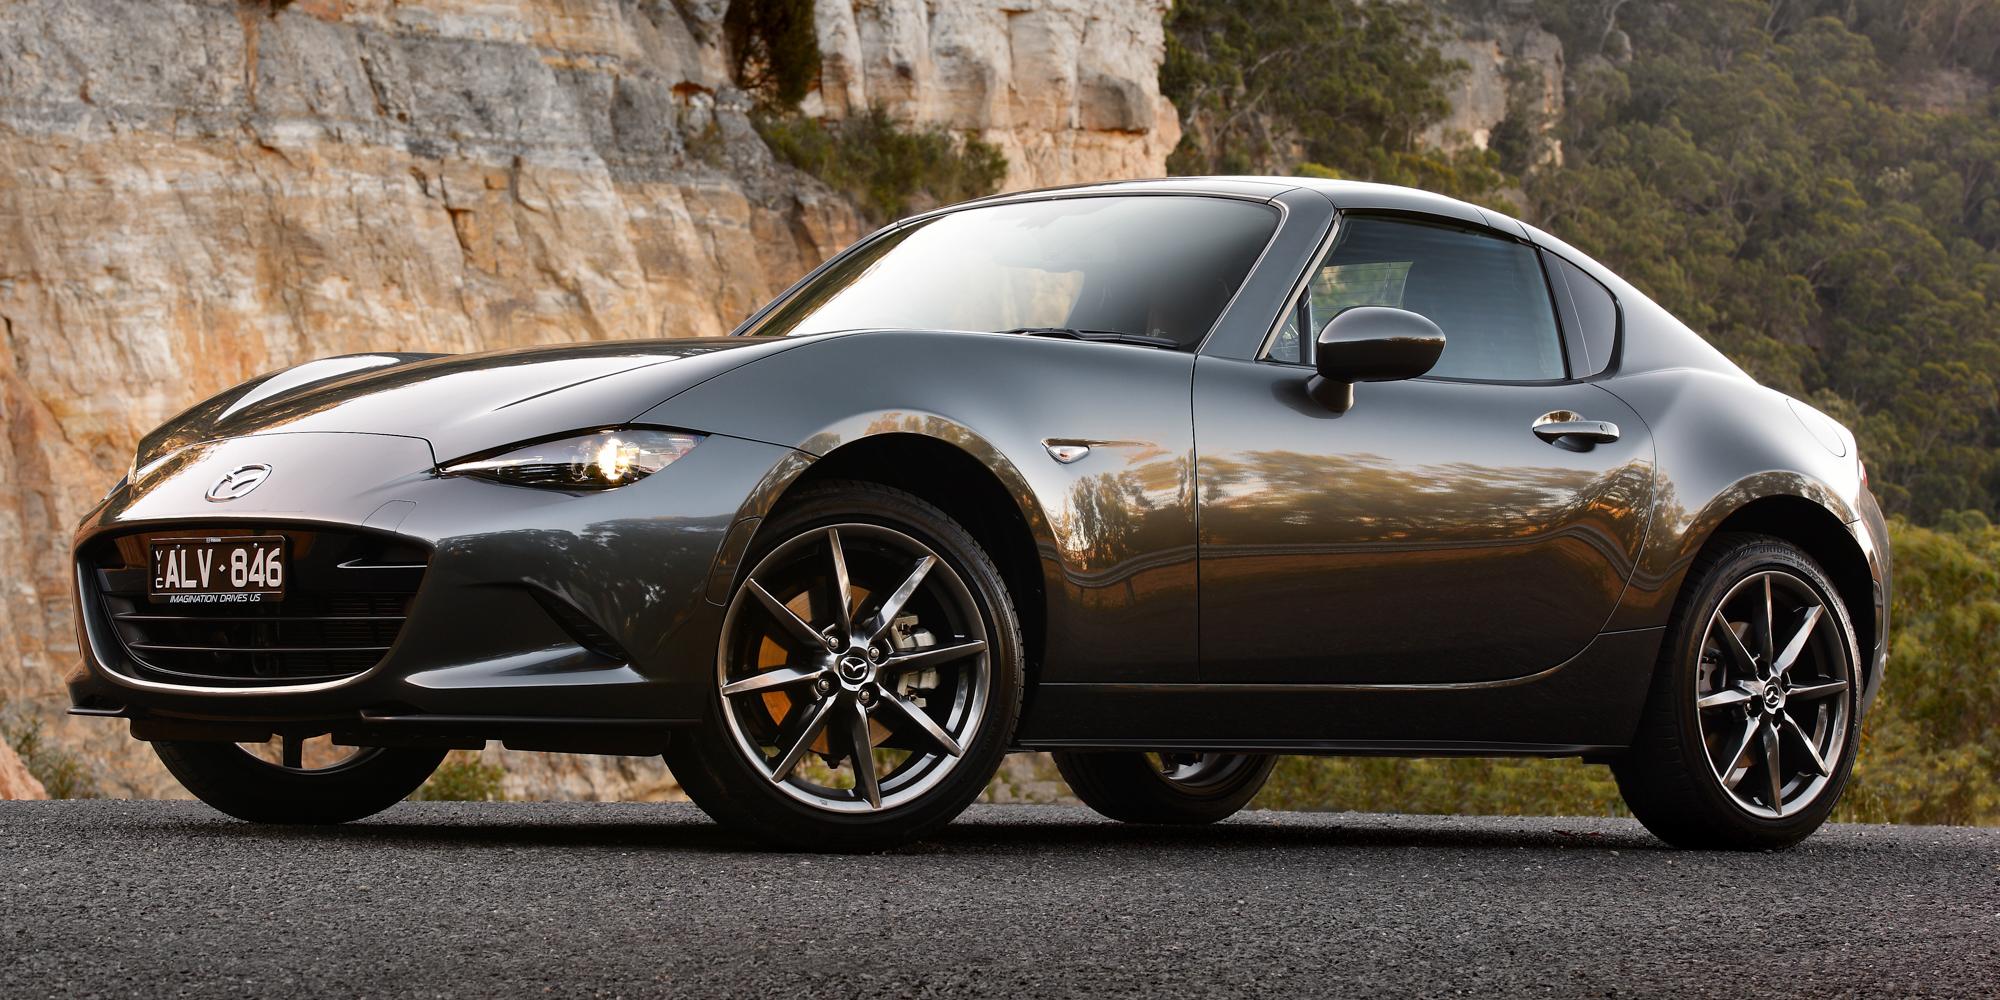 2017 Mazda MX-5 RF review | CarAdvice